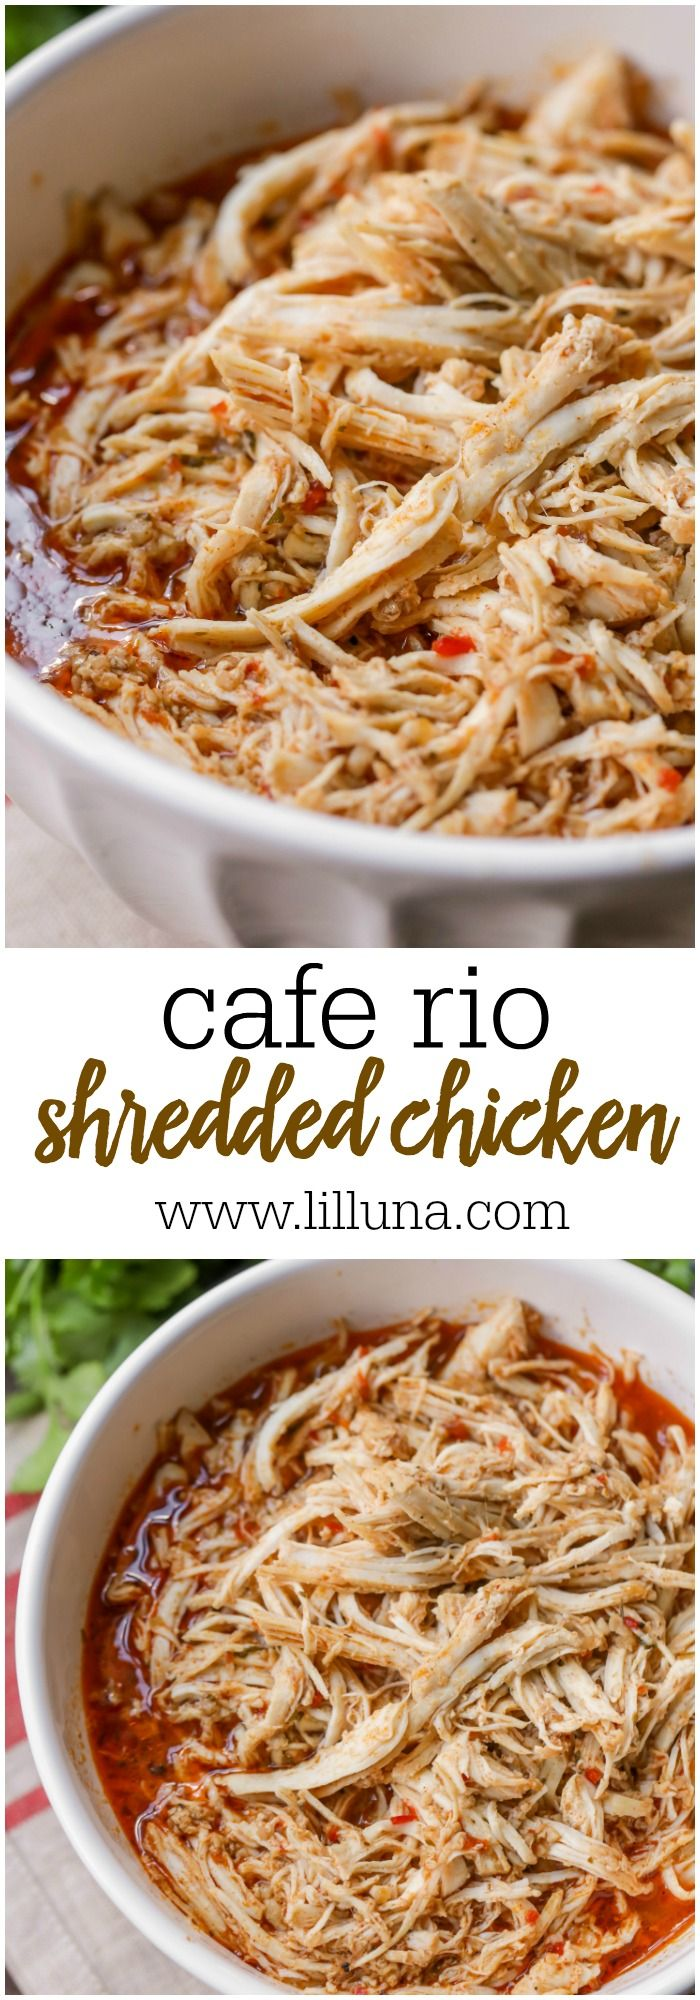 Copycat Cafe Rio Shredded Chicken Recipe | Lil' Luna